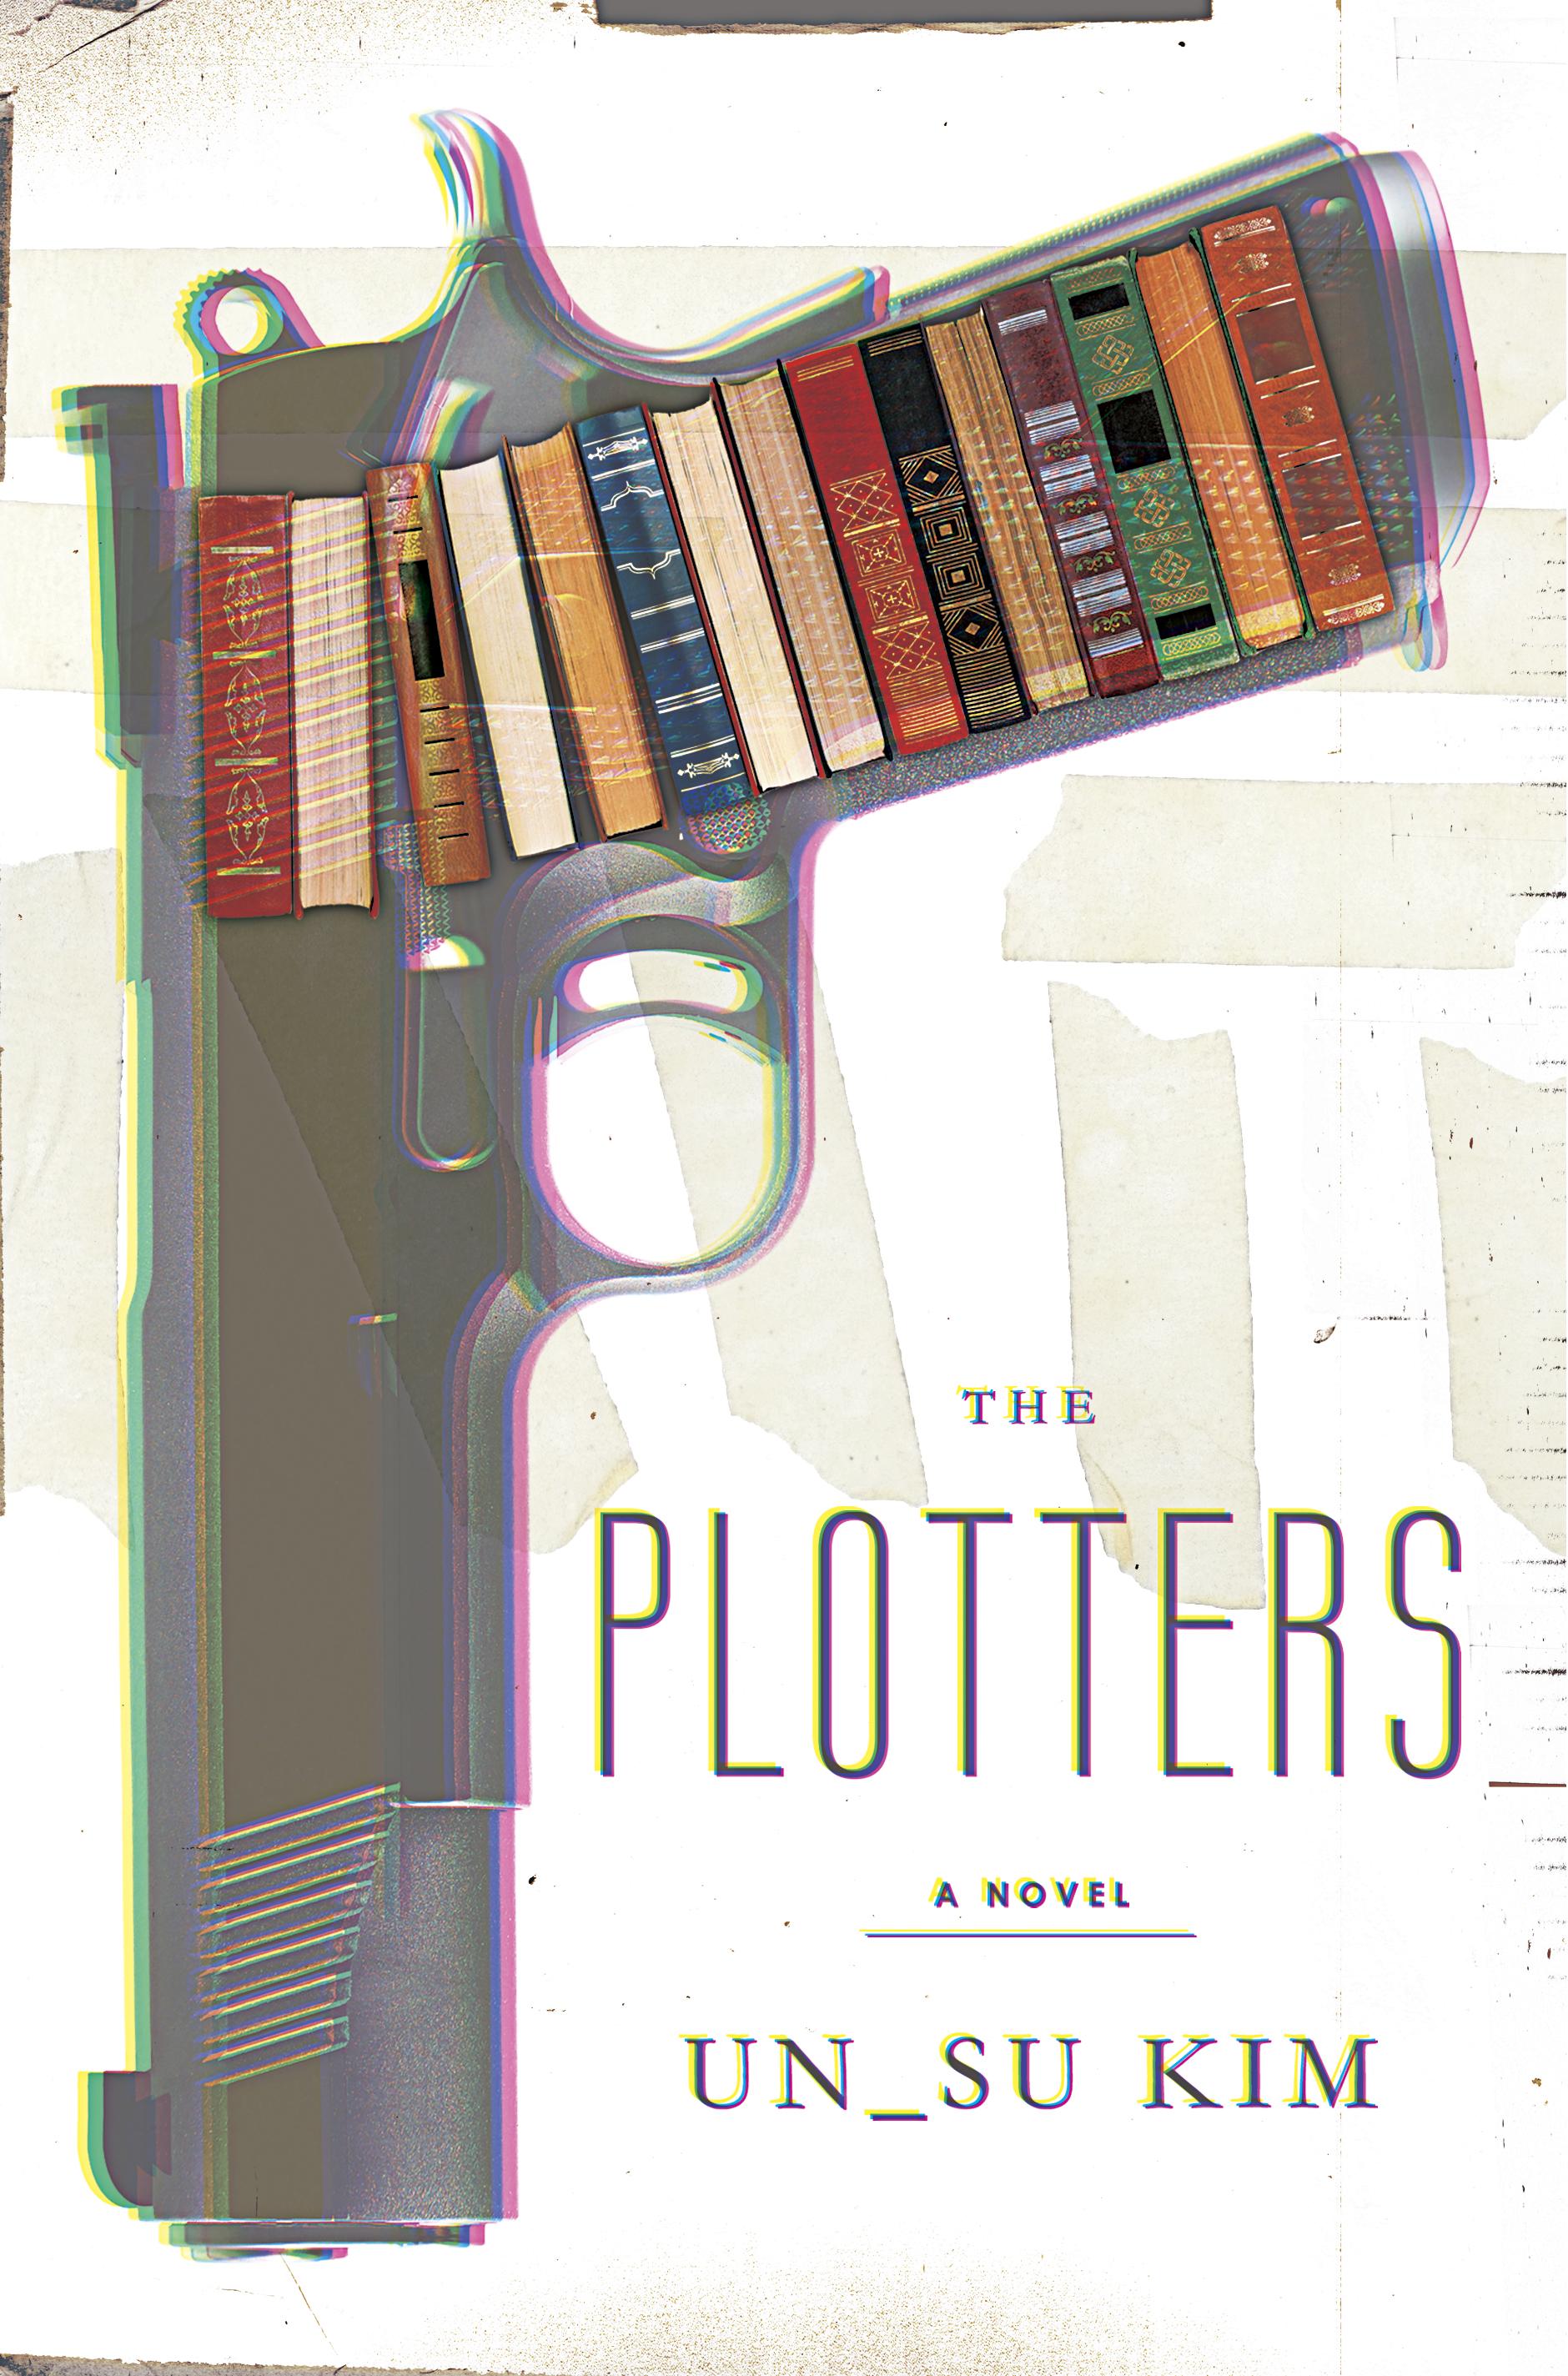 plotters art 4.jpg